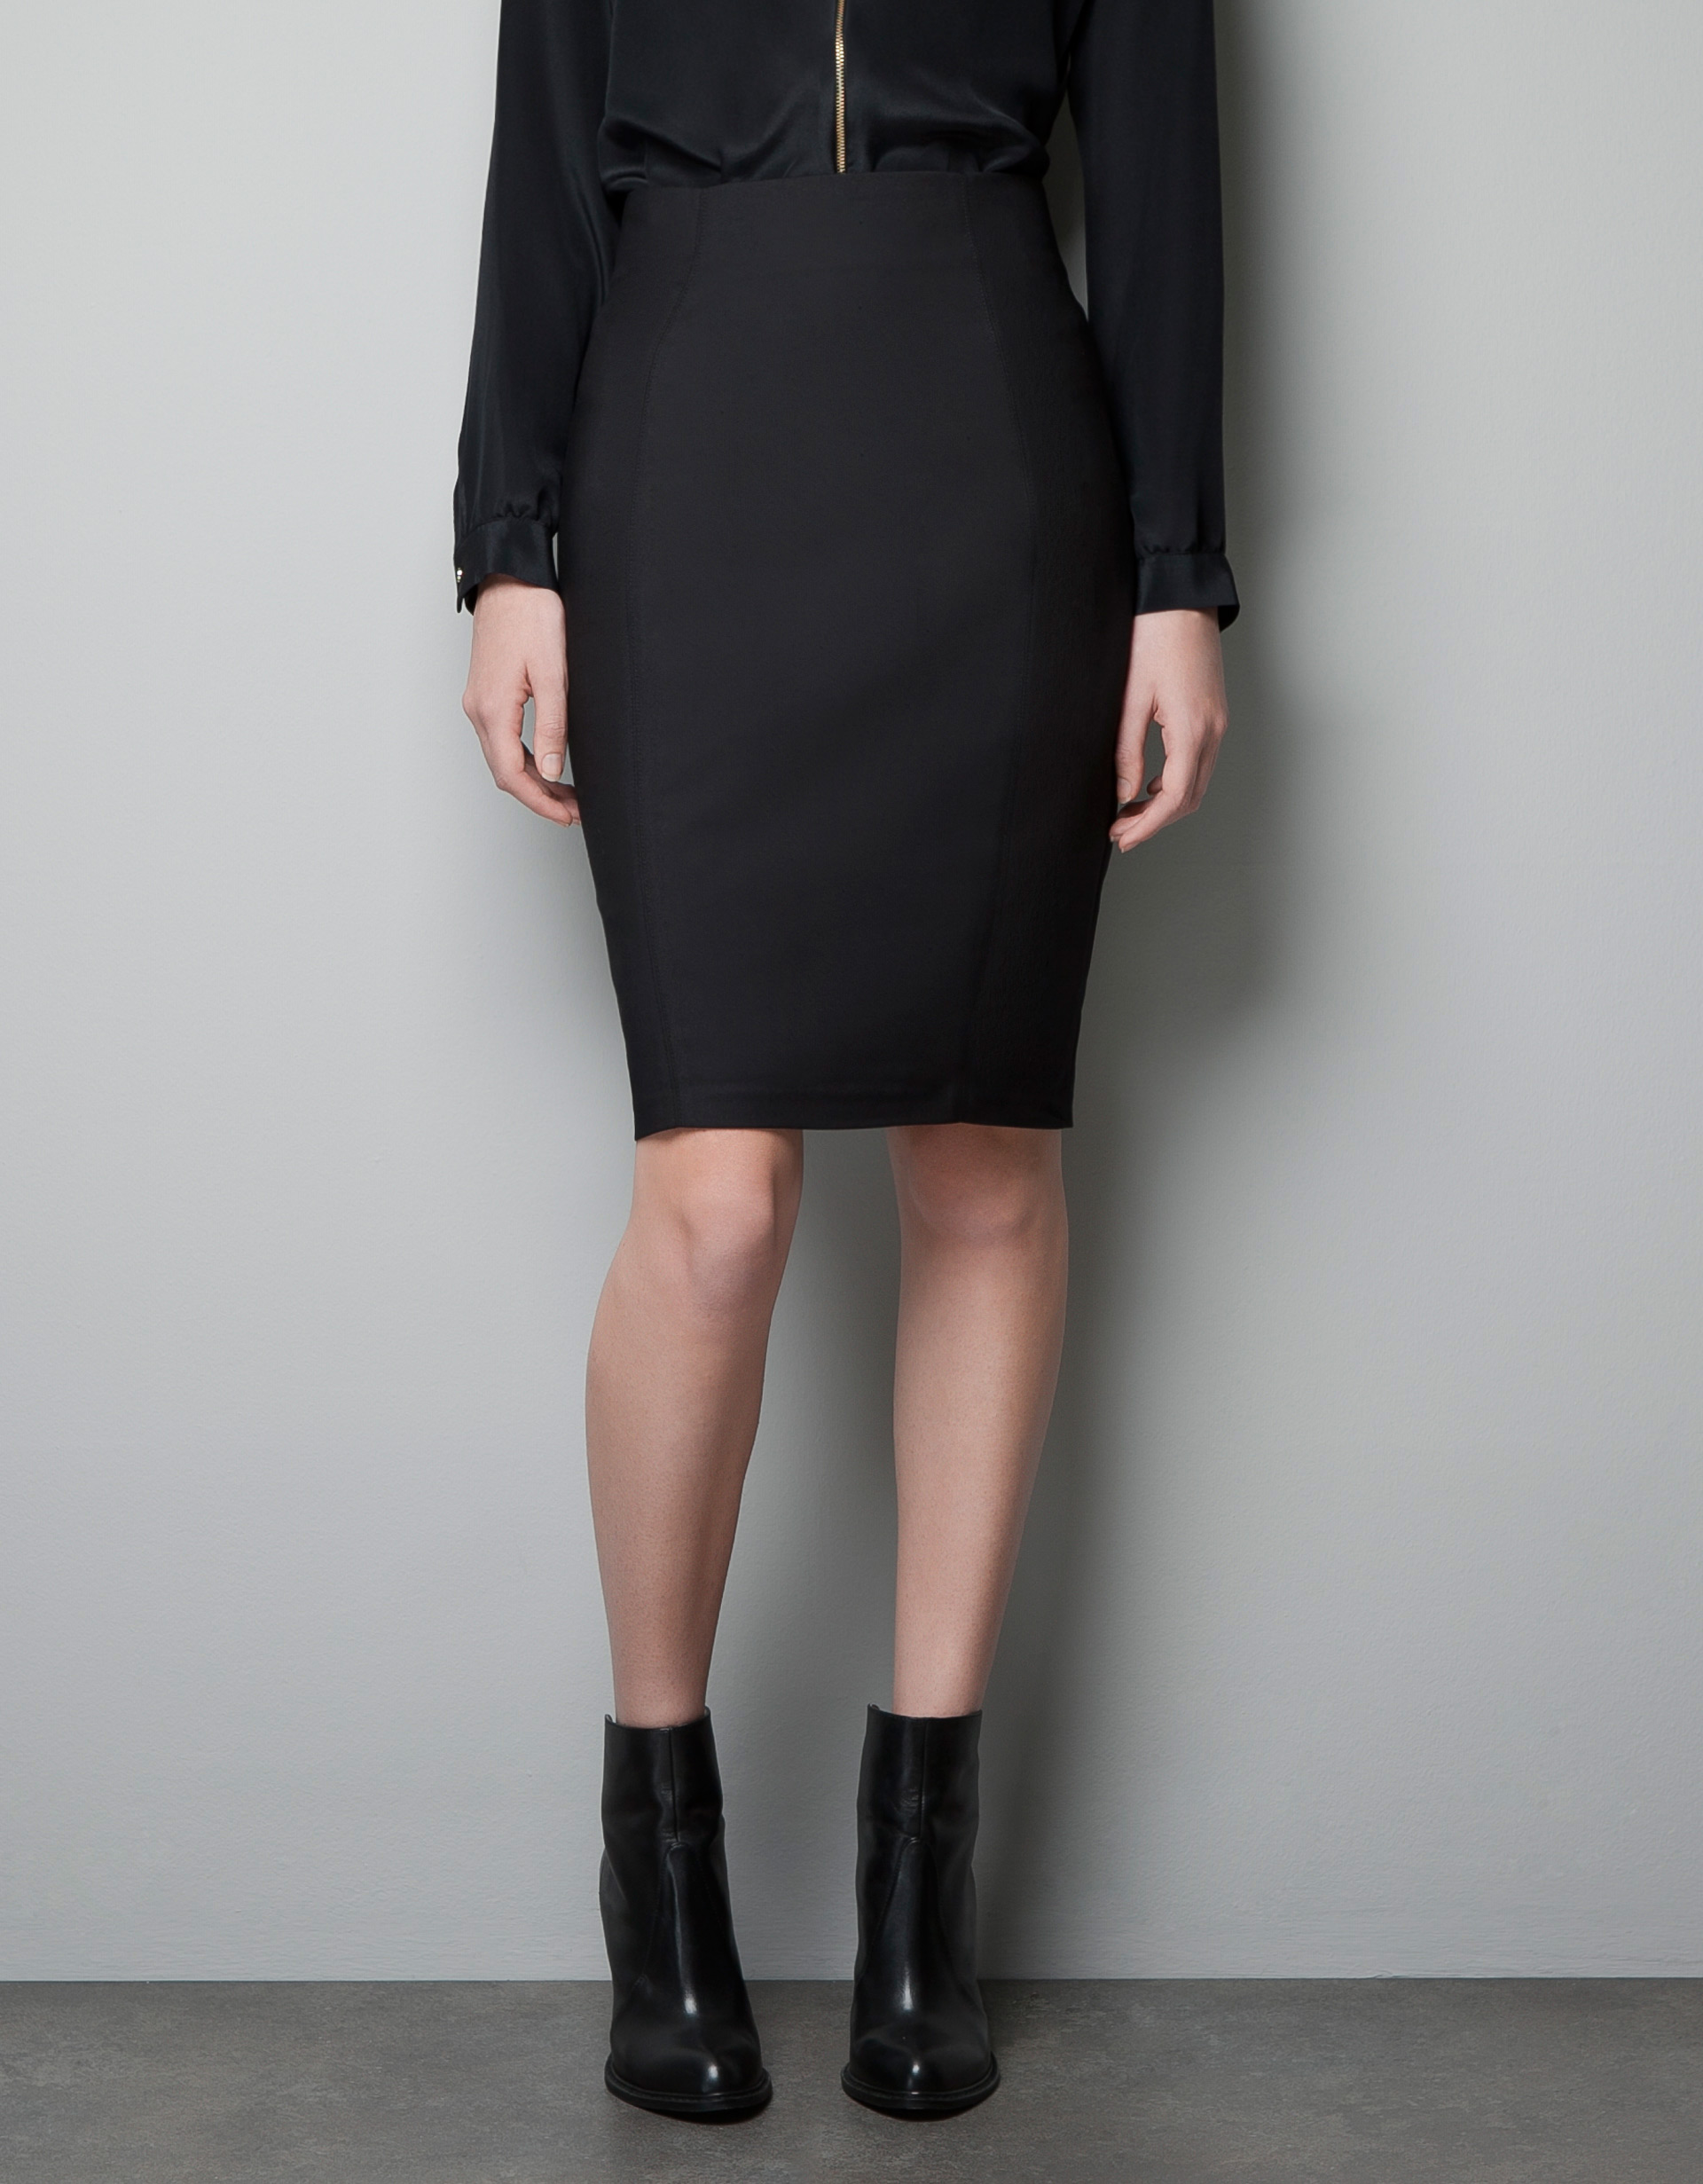 Zara Pencil Skirt with Zip in Black | Lyst